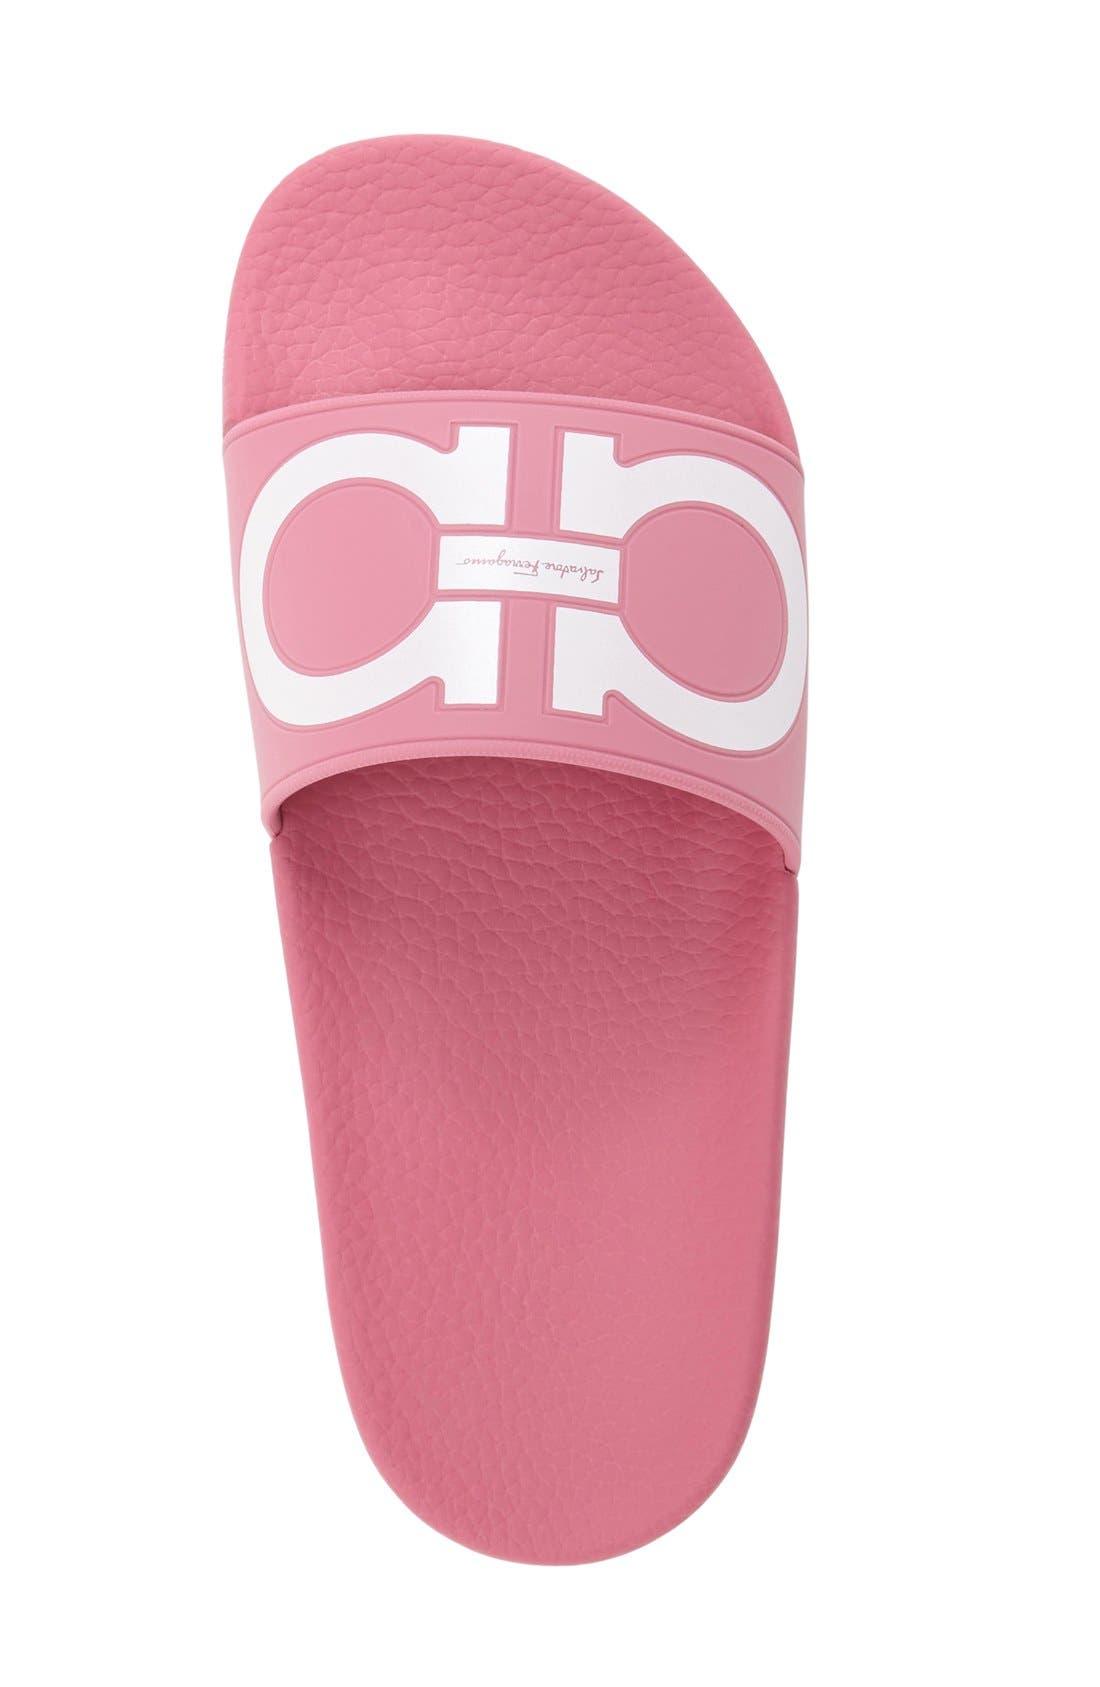 Groove Logo Slide Sandal,                             Alternate thumbnail 3, color,                             Bubble Gum Pink/ White